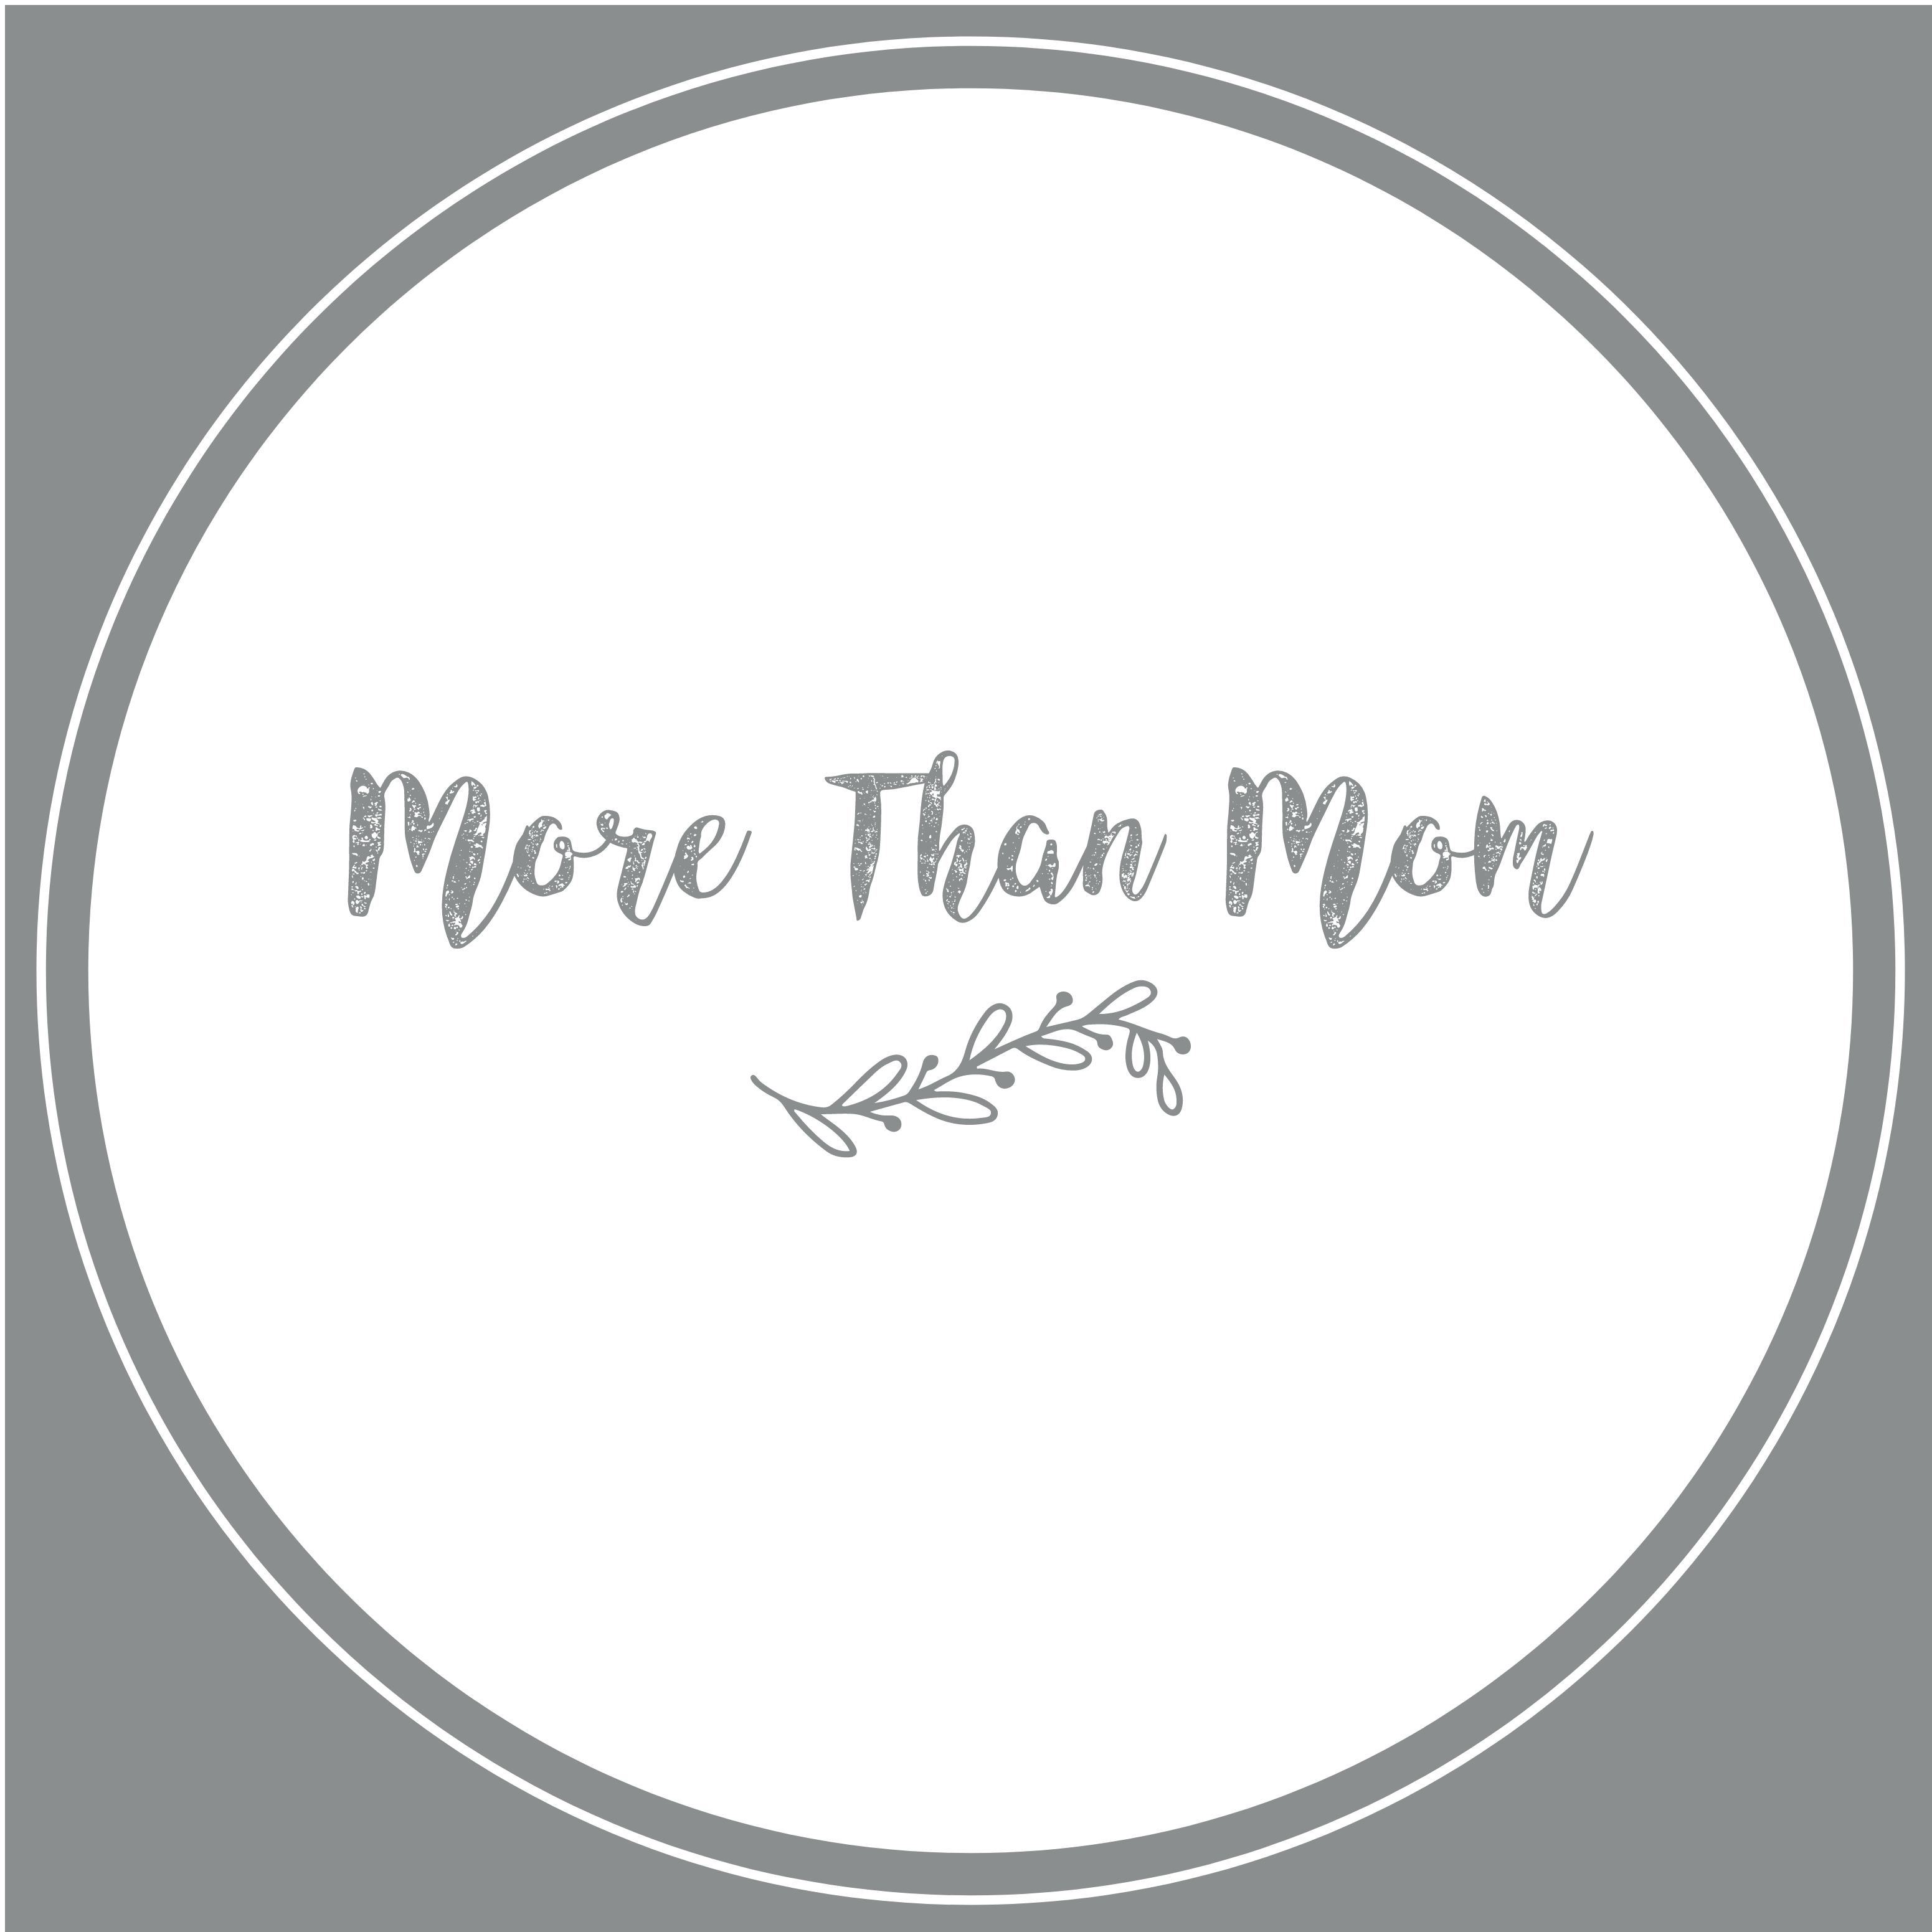 More Than Mom